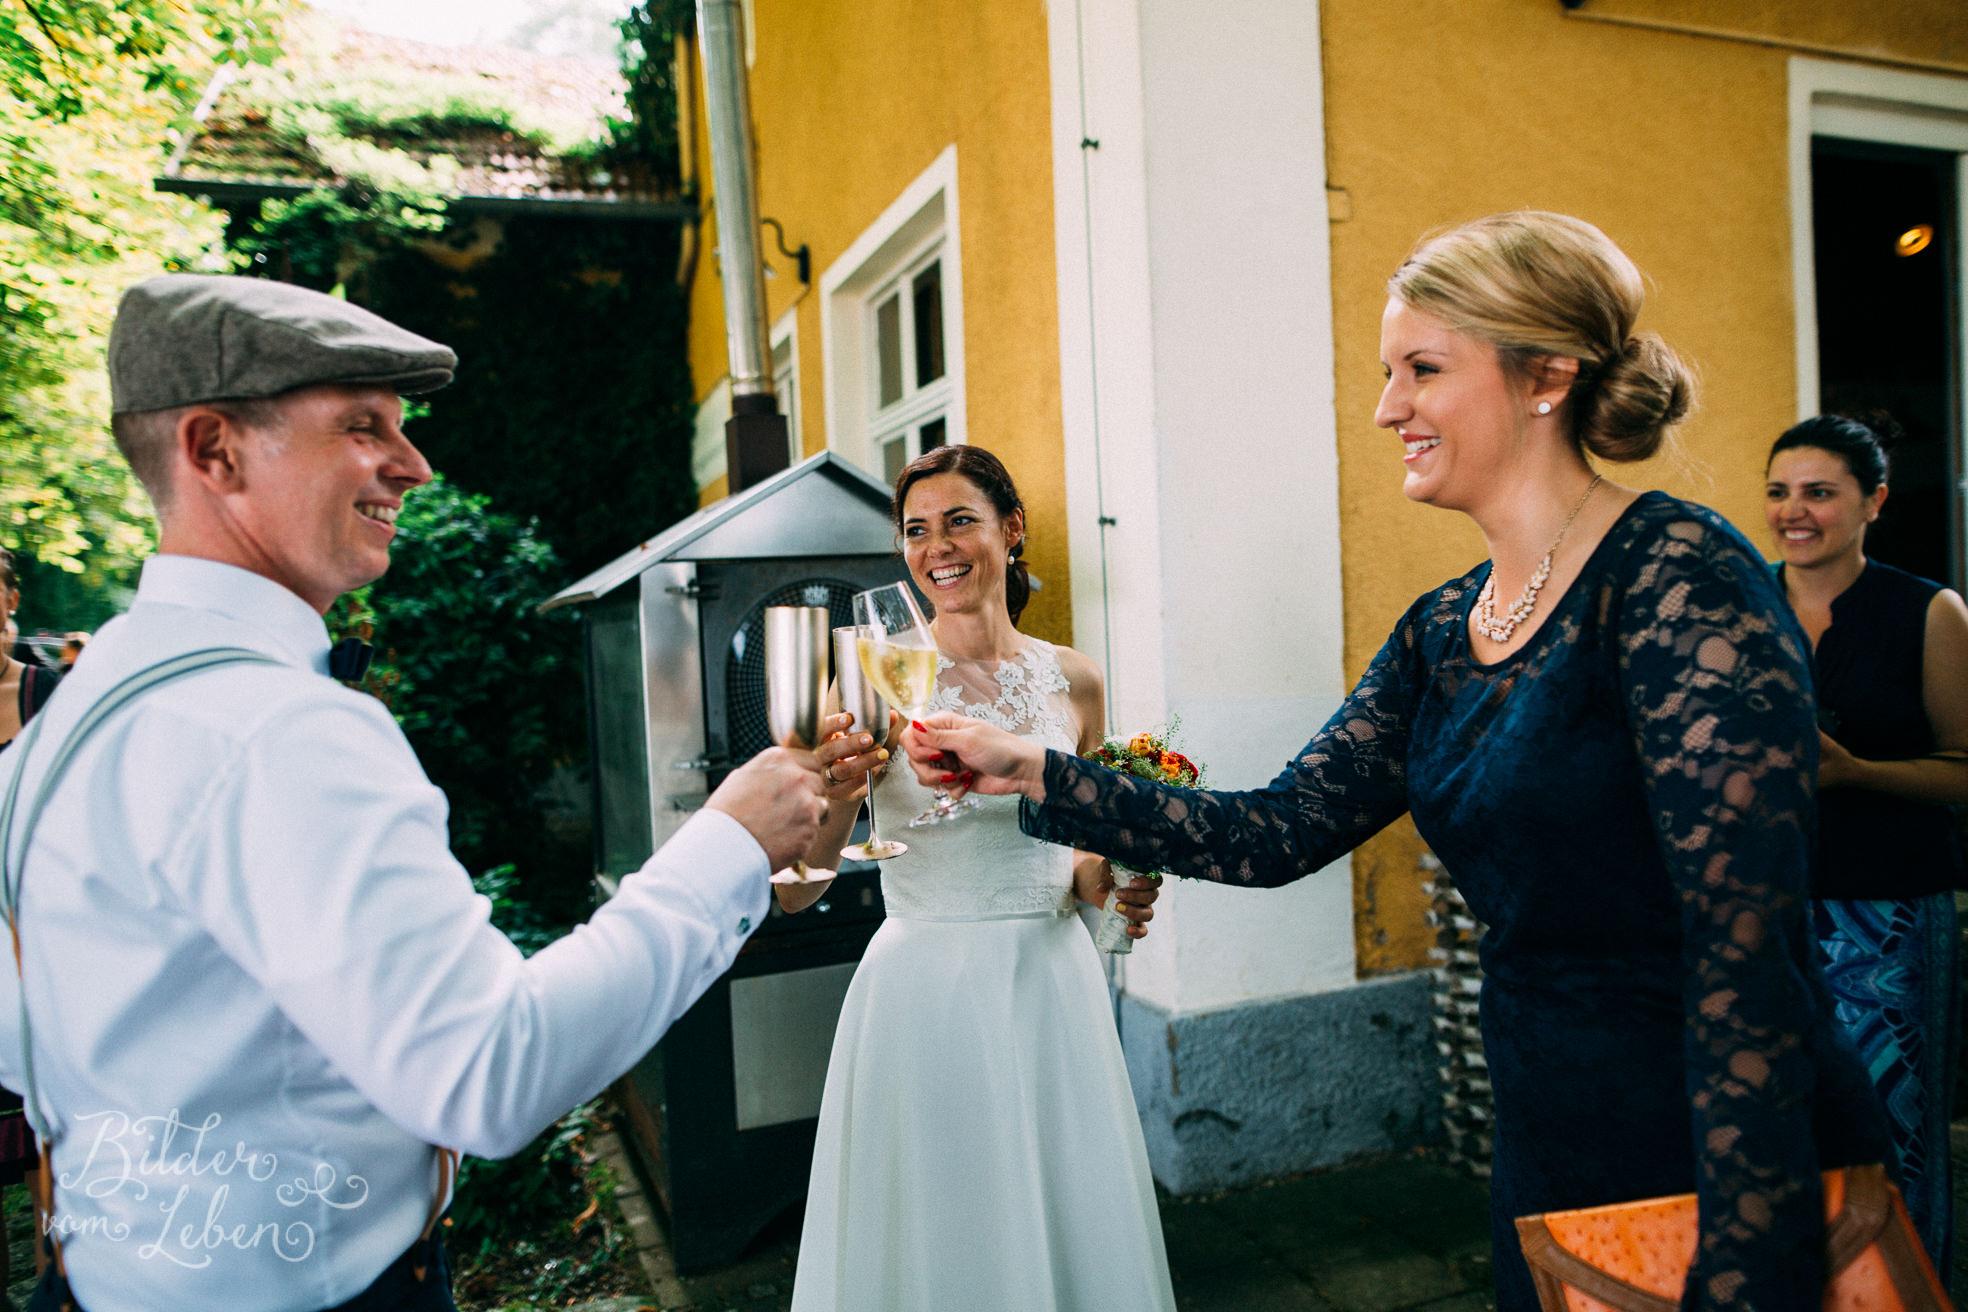 102BildervomLeben-Vintagehochzeit-Noerdlingen-2016